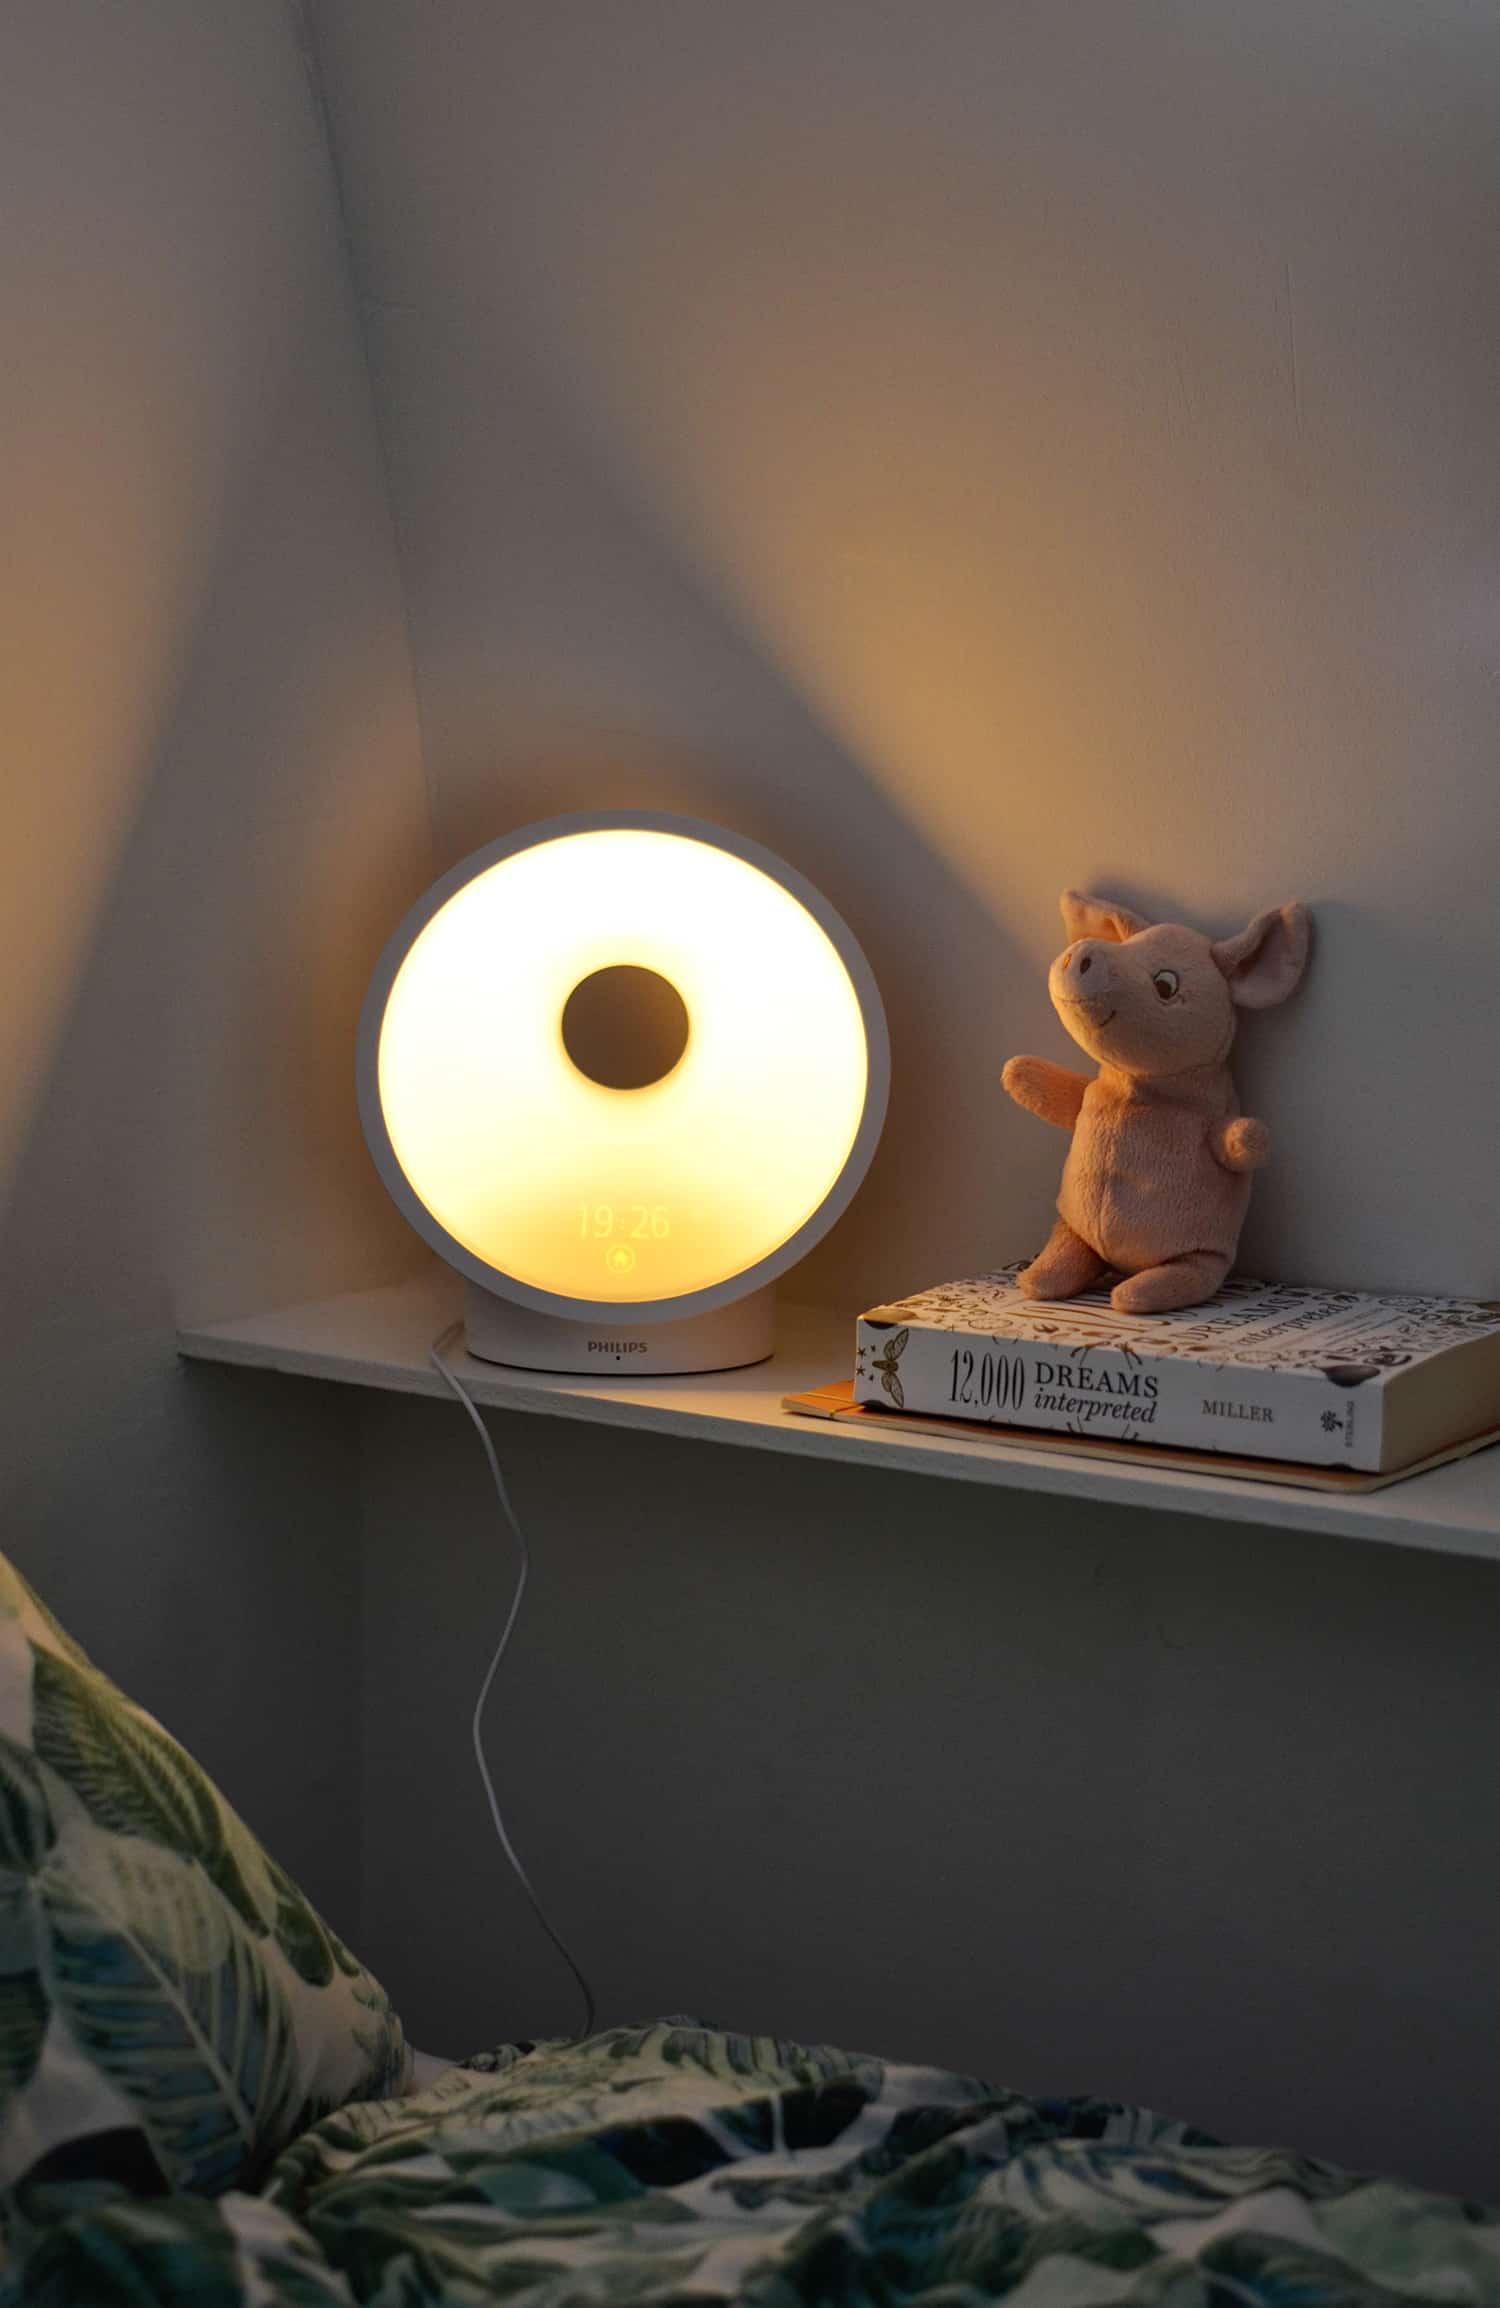 Review Somneo wake-up light: de redder in nood bij donkere dagen